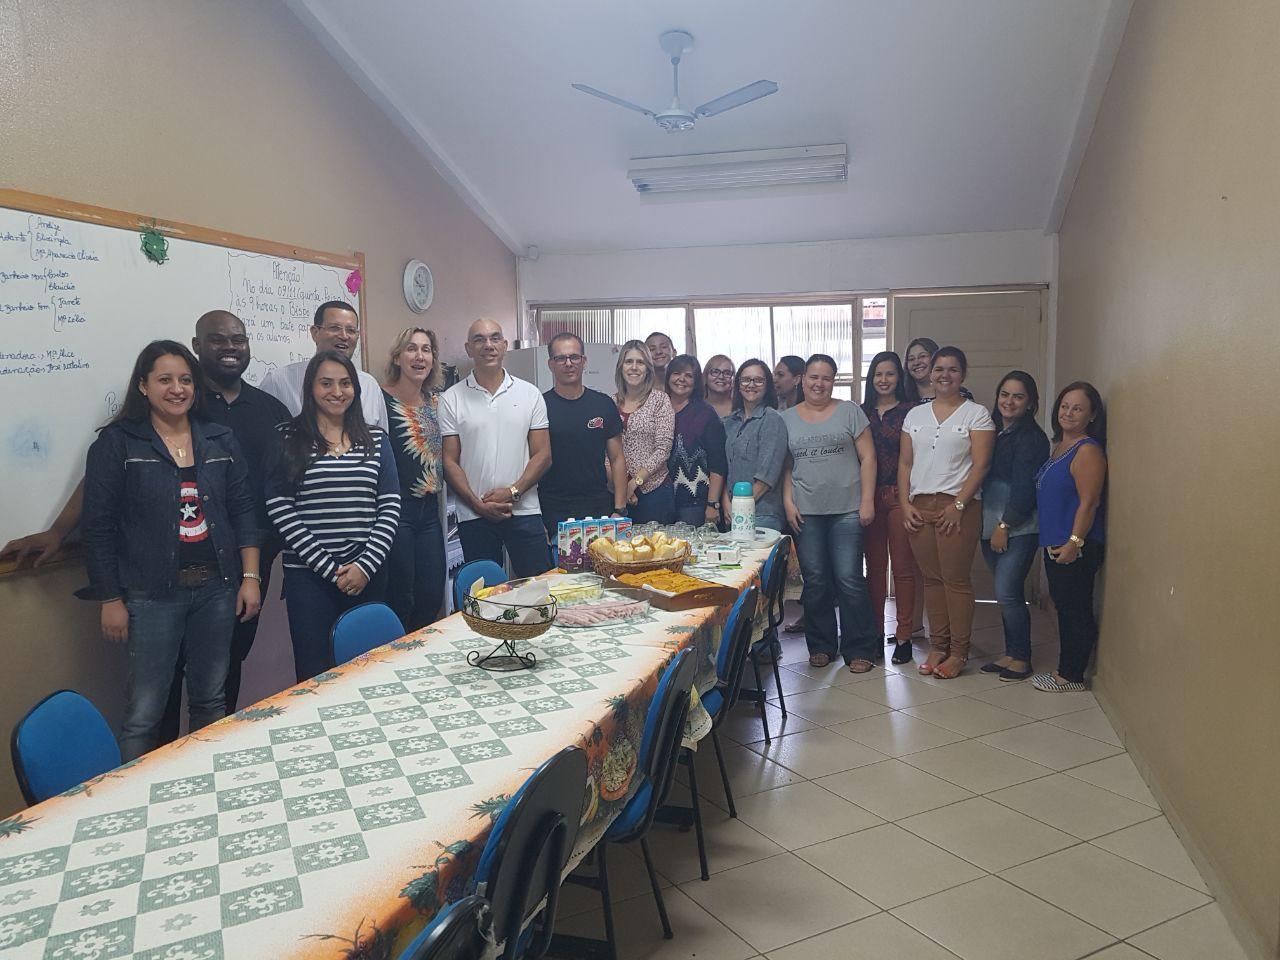 Visita Pastoral de Dom José Eudes na Paróquia São Paulo